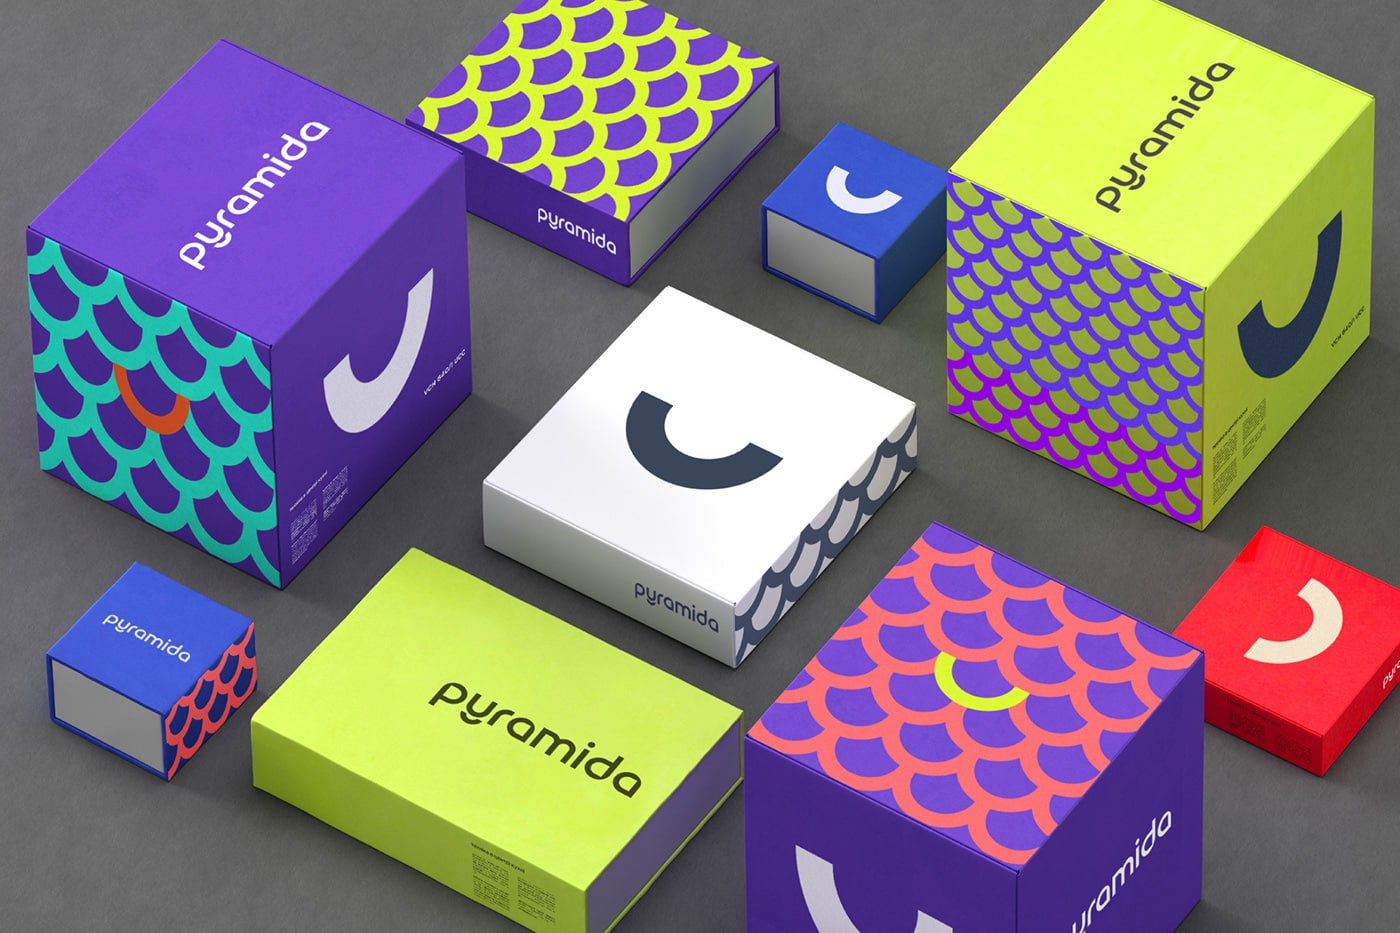 2017 graphic print design trends pattern flat design packaging neons